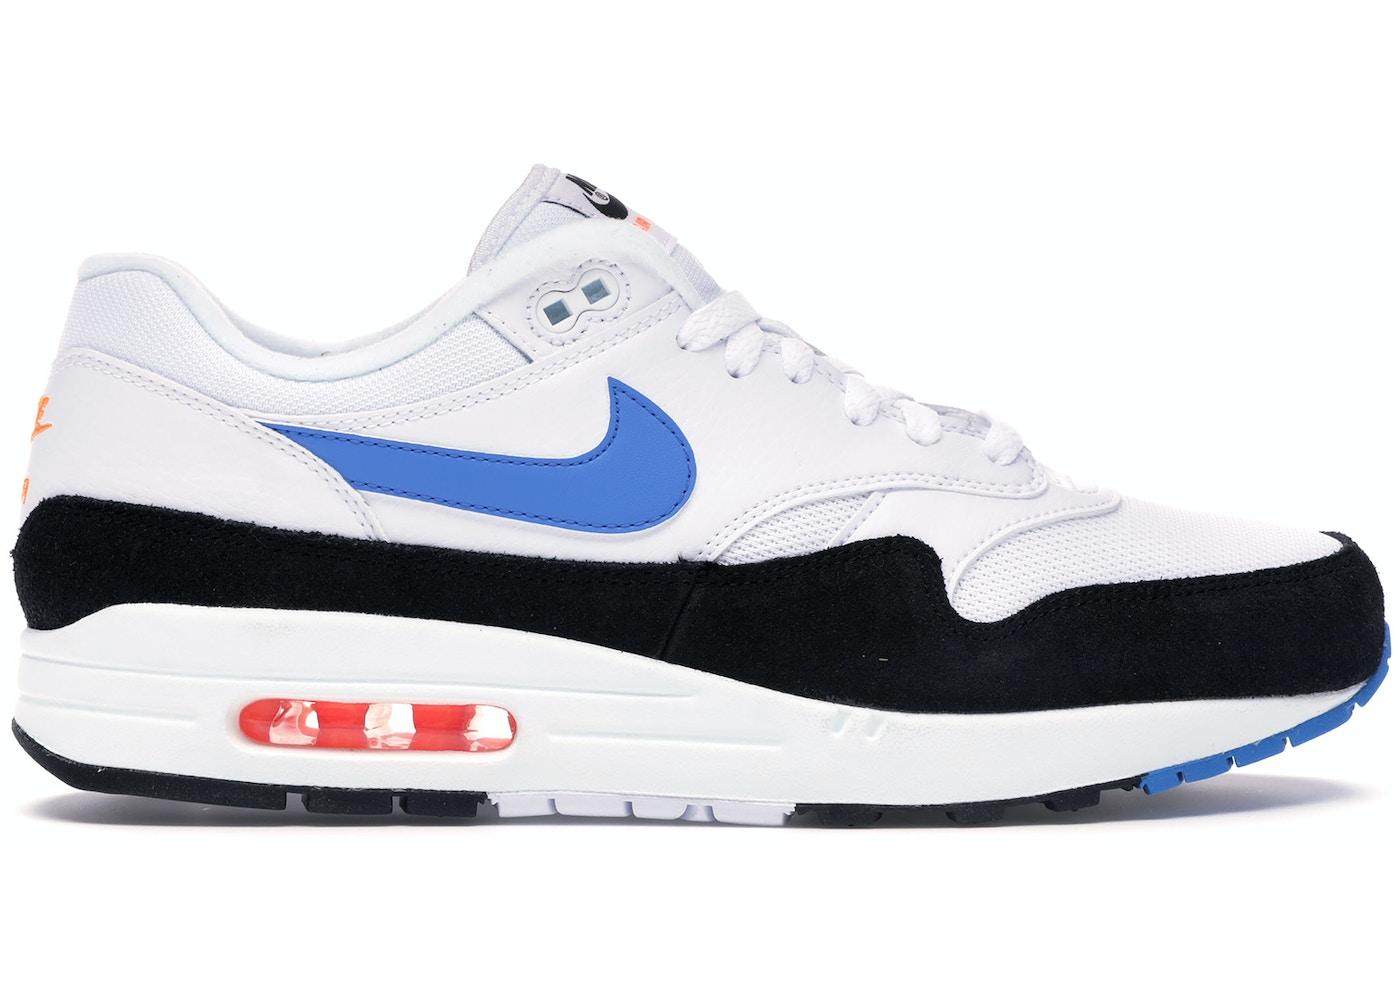 Patológico Tormenta Garganta  Nike Air Max 1 White Photo Blue Black - AH8145-112